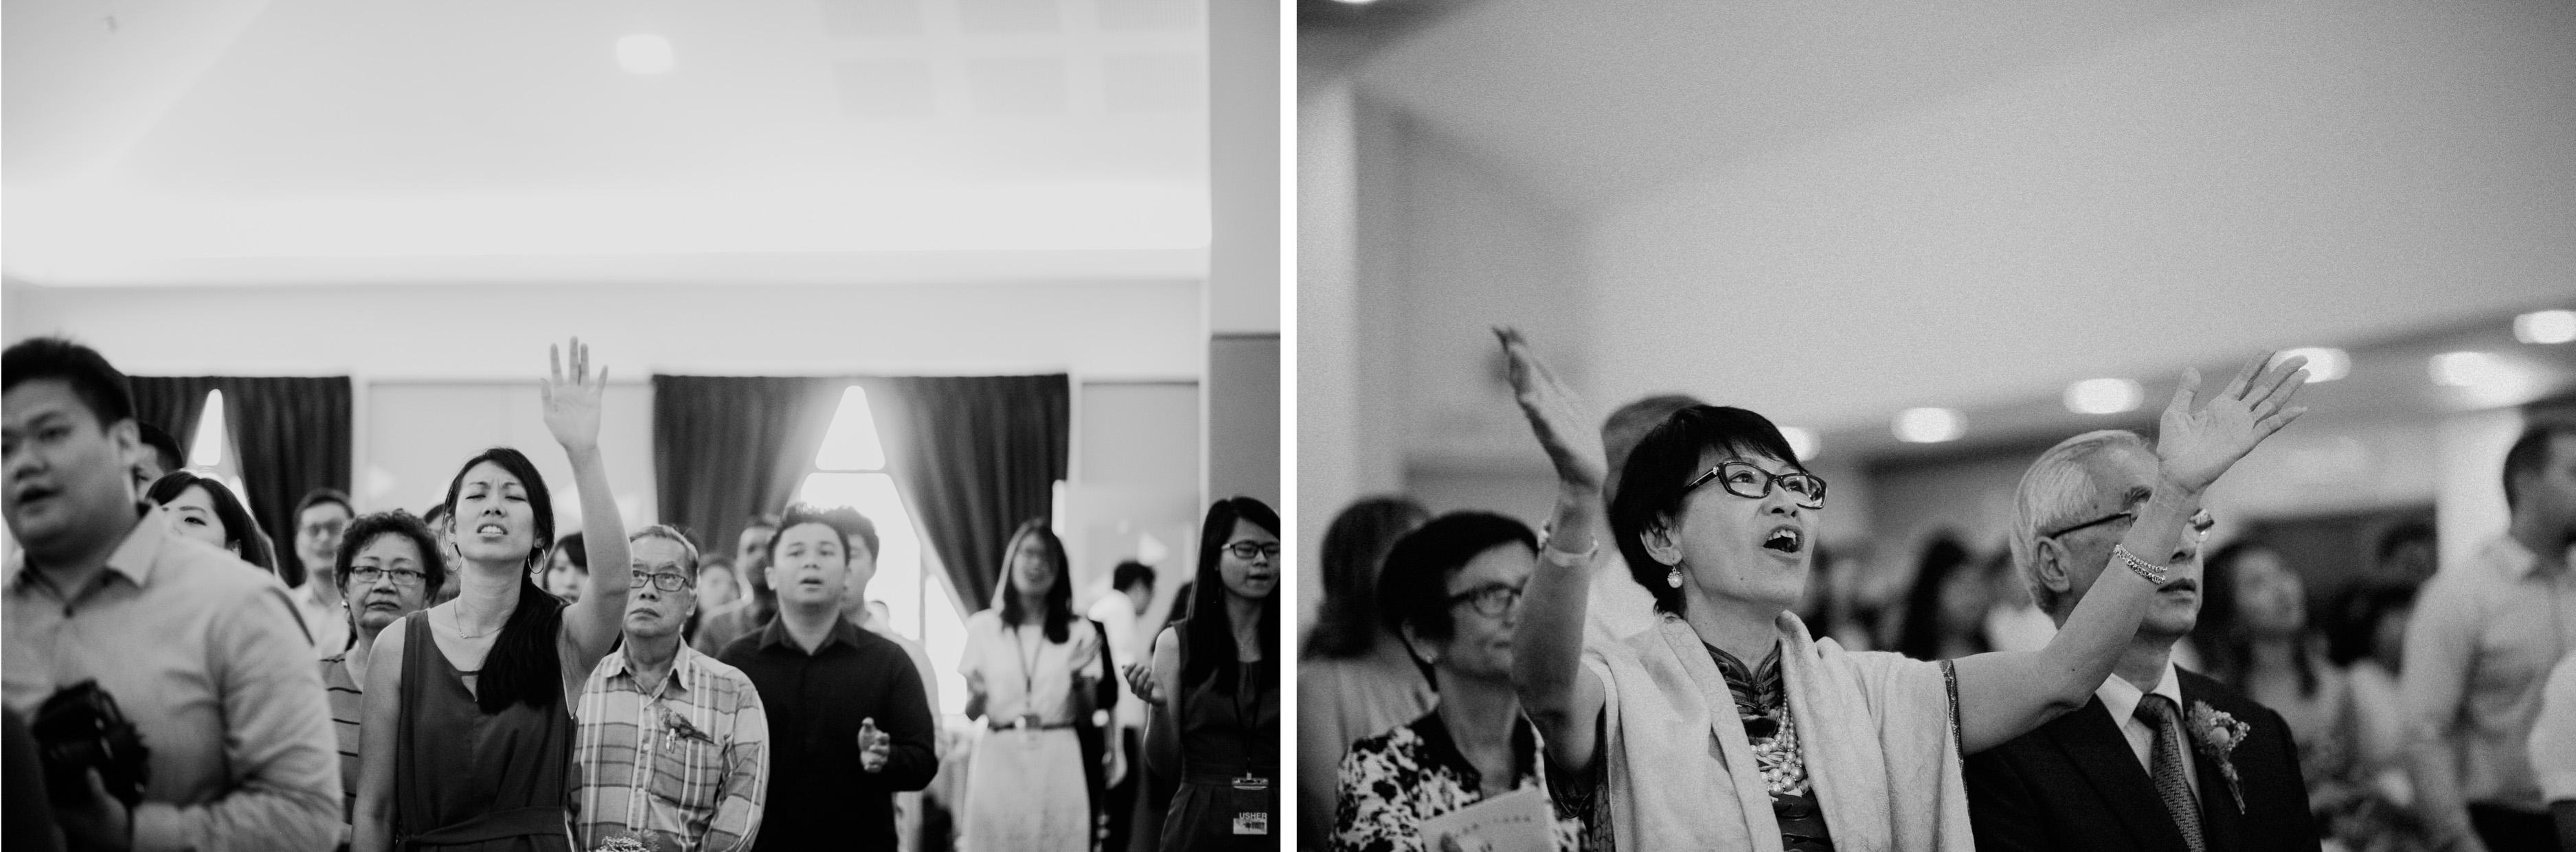 50-hellojanelee-sam grace-malaysia-wedding-day